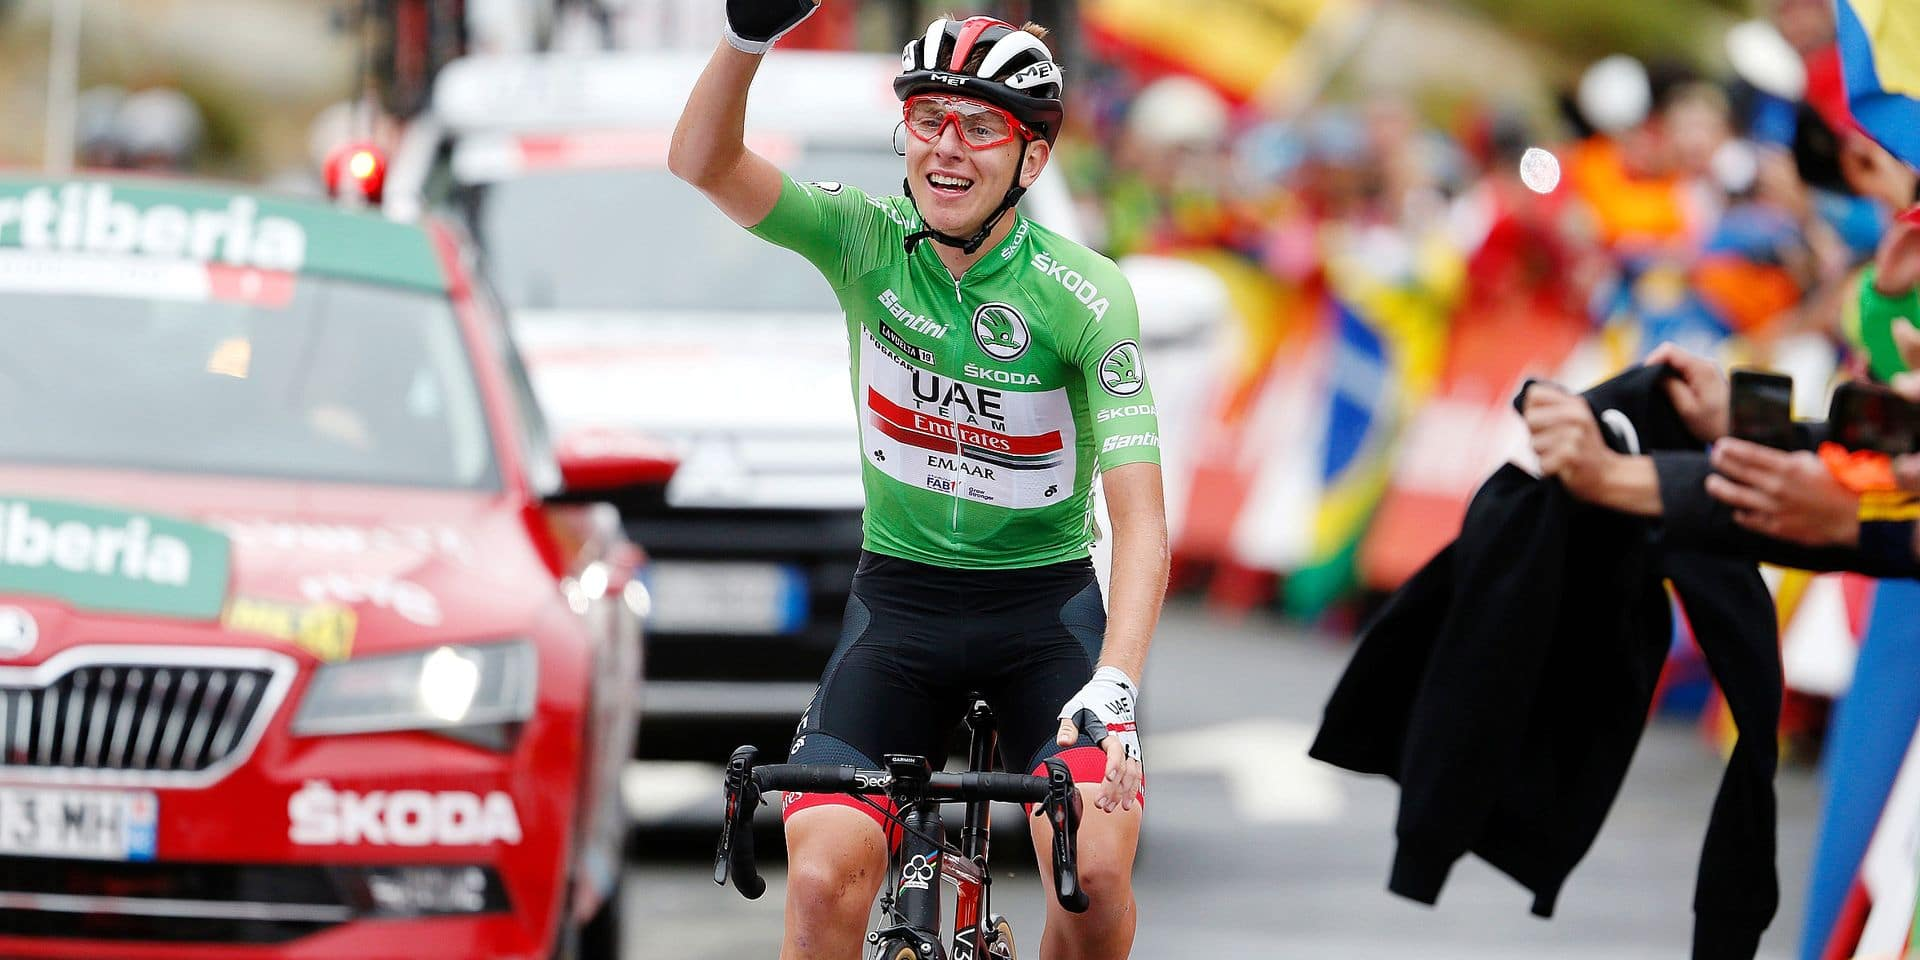 SlovenianTadej Pogacar of UAE Team Emirates celebrates after winning stage 20 of the 2019 edition of the 'Vuelta a Espana', Tour of Spain cycling race, from Arenas de San Pedro to Plataforma de Gredos (190,4 km), Saturday 14 September 2019. BELGA PHOTO YUZURU SUNADA - FRANCE OUT